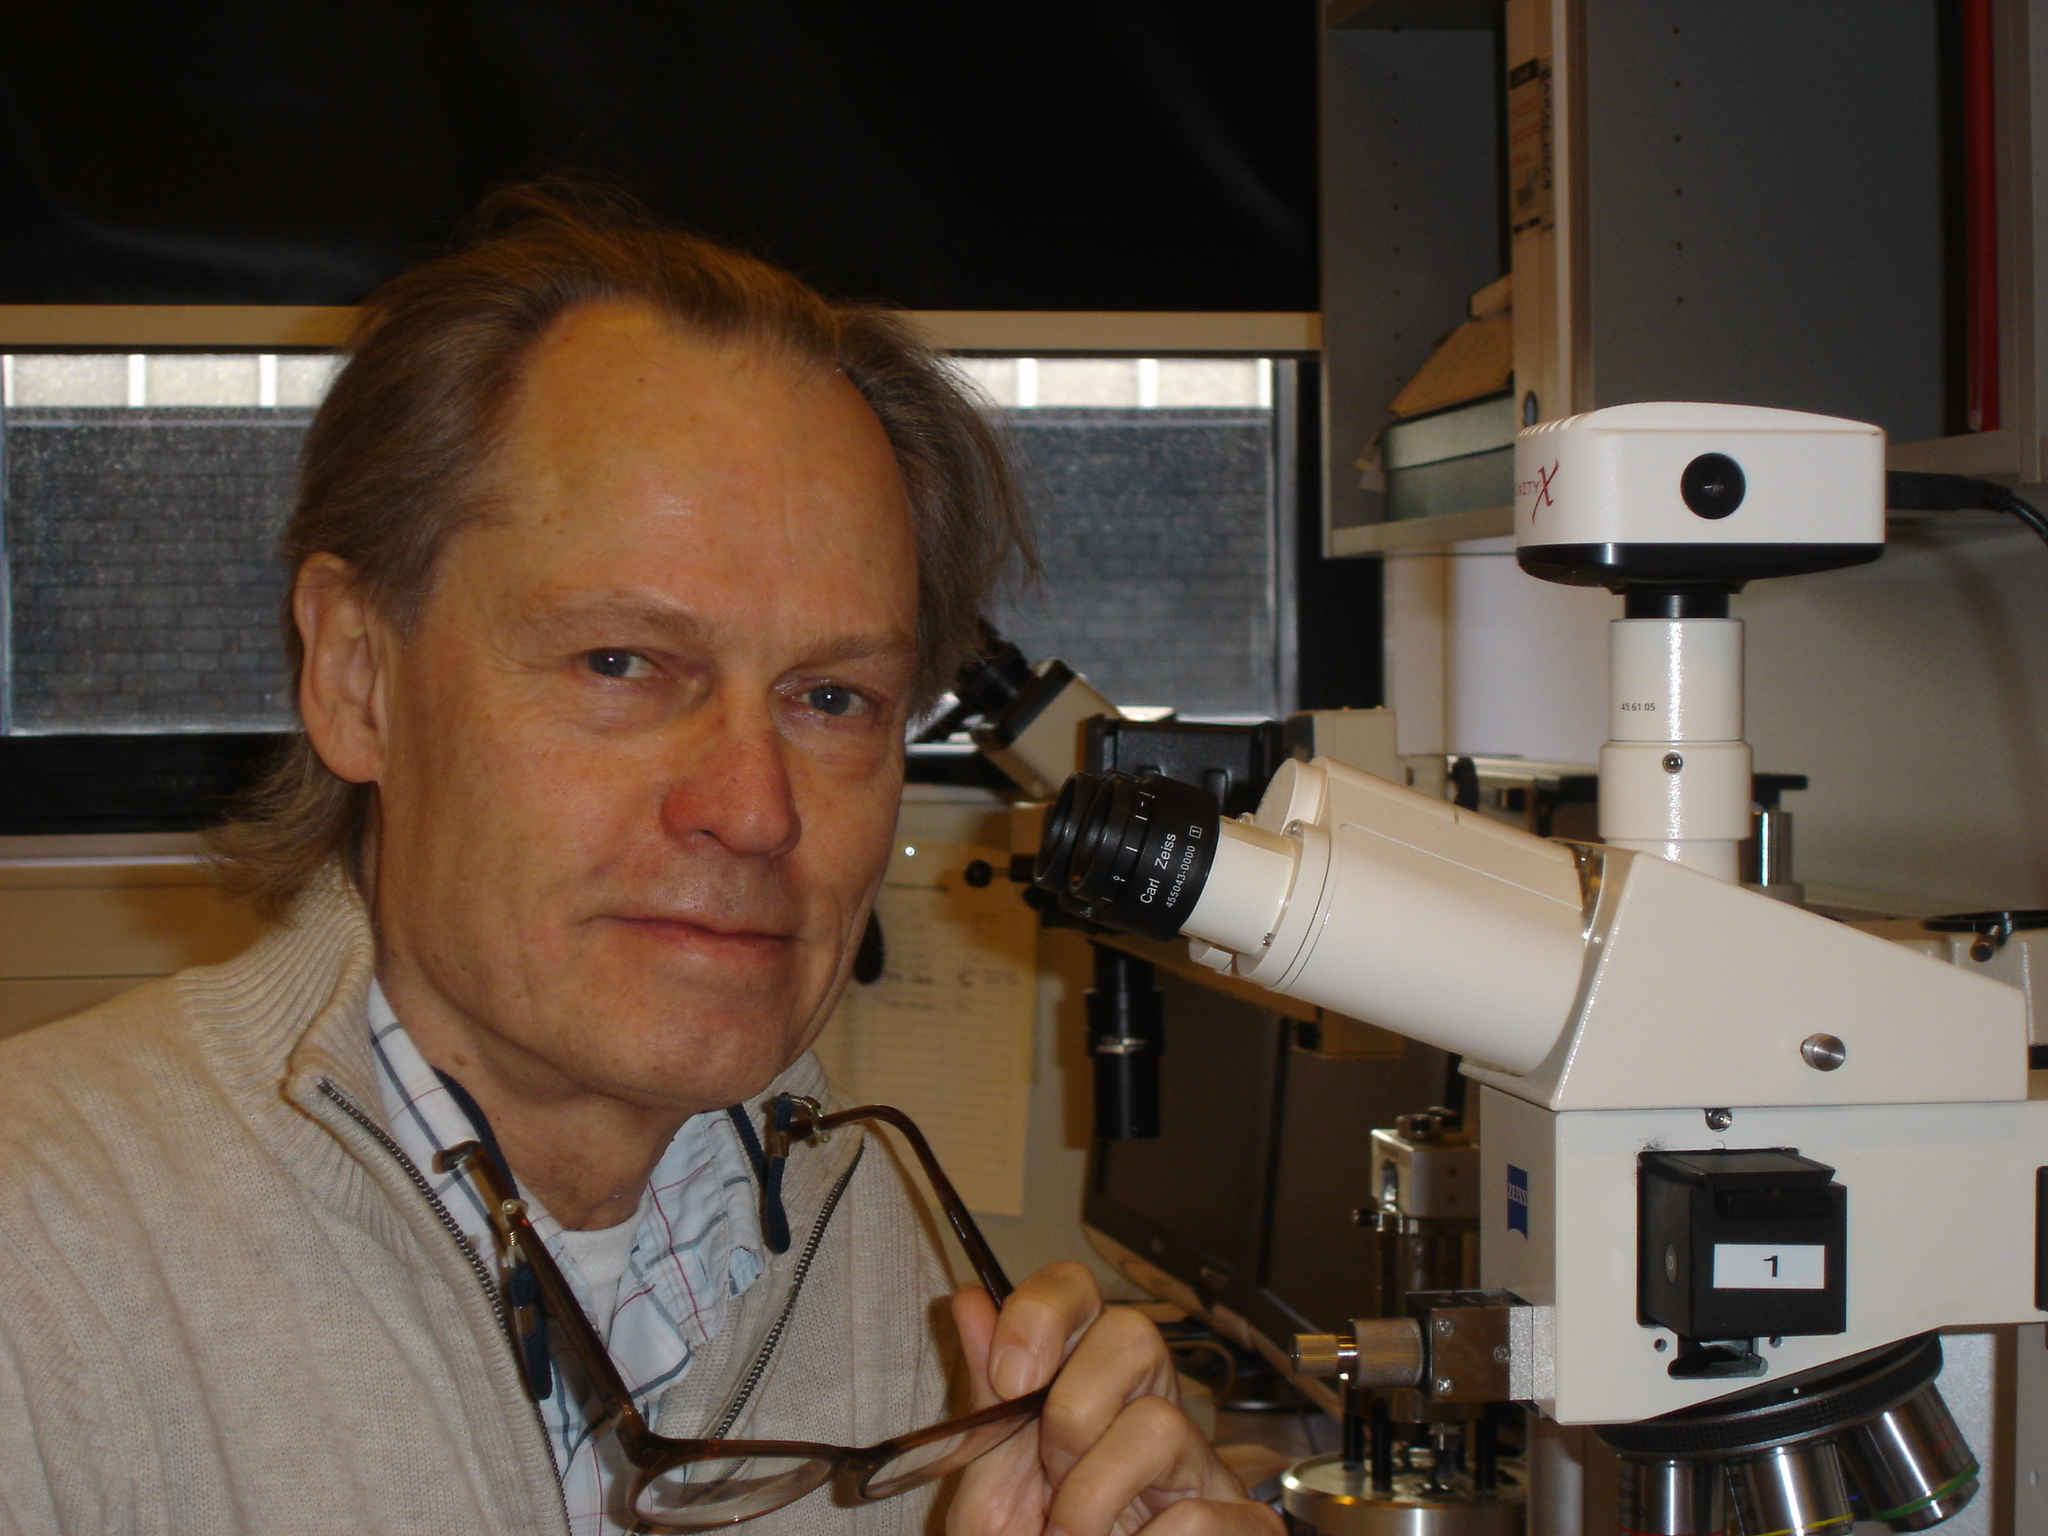 Caption: Dr. Niels Harrit at microscope